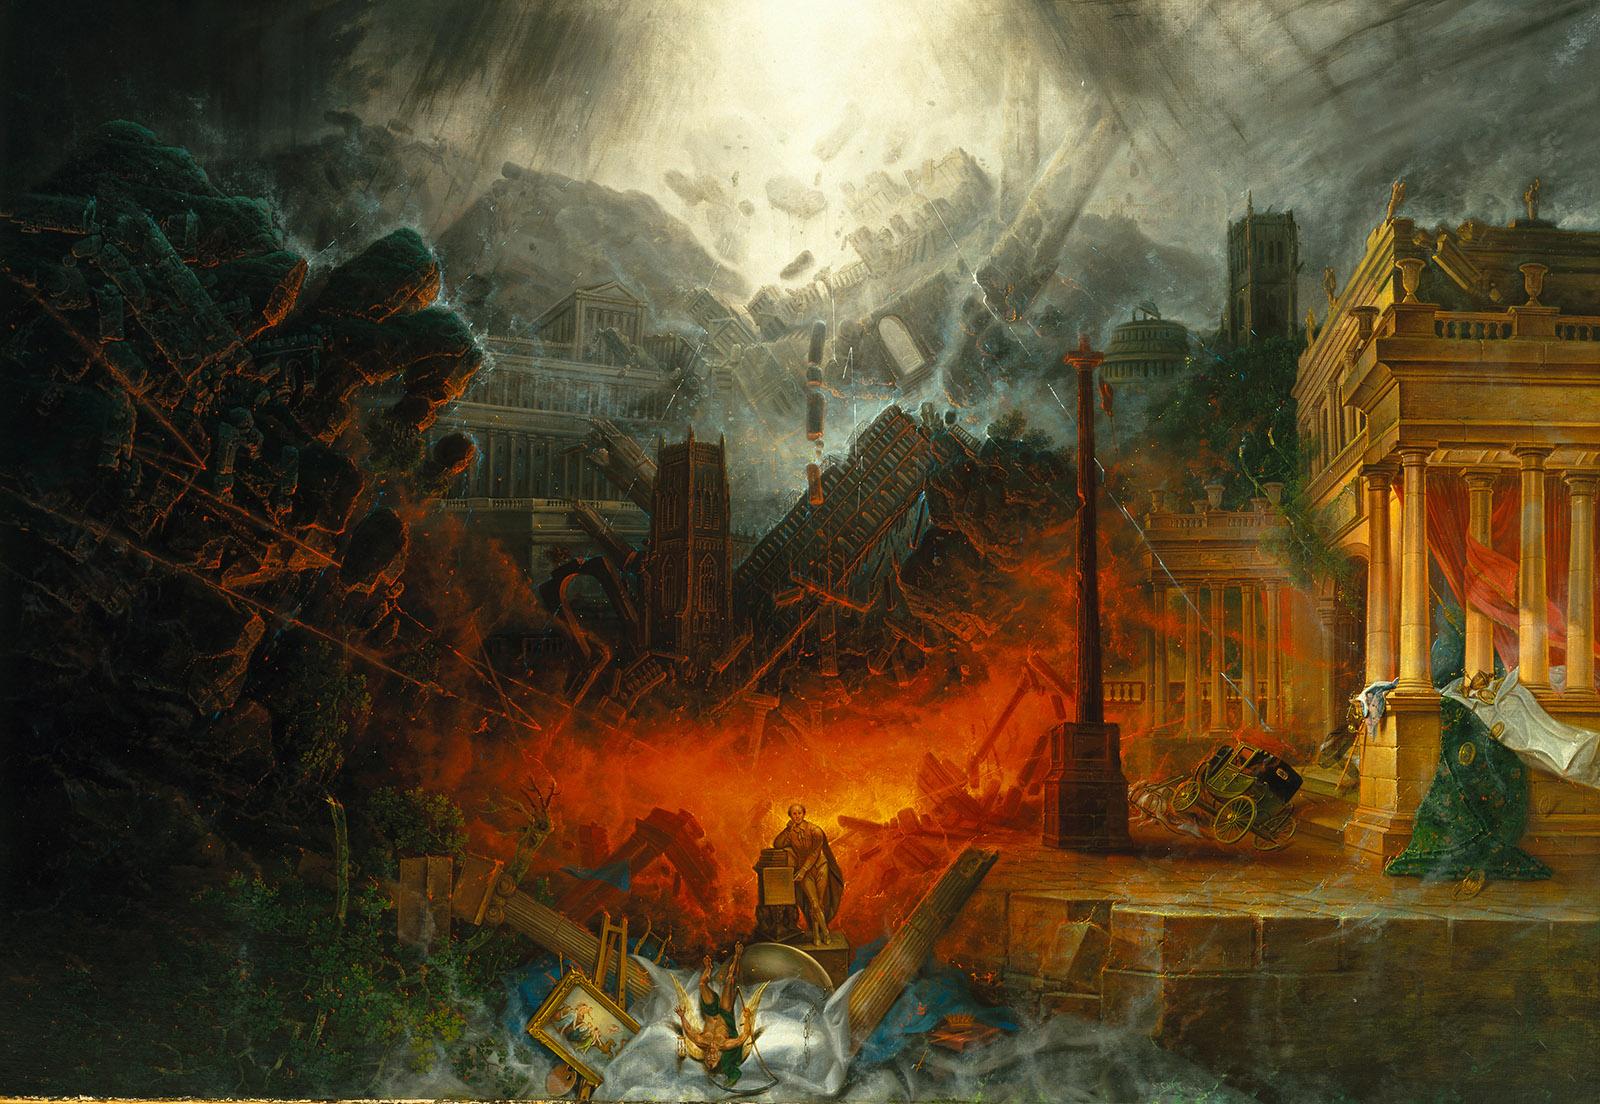 Edge of Doom painting